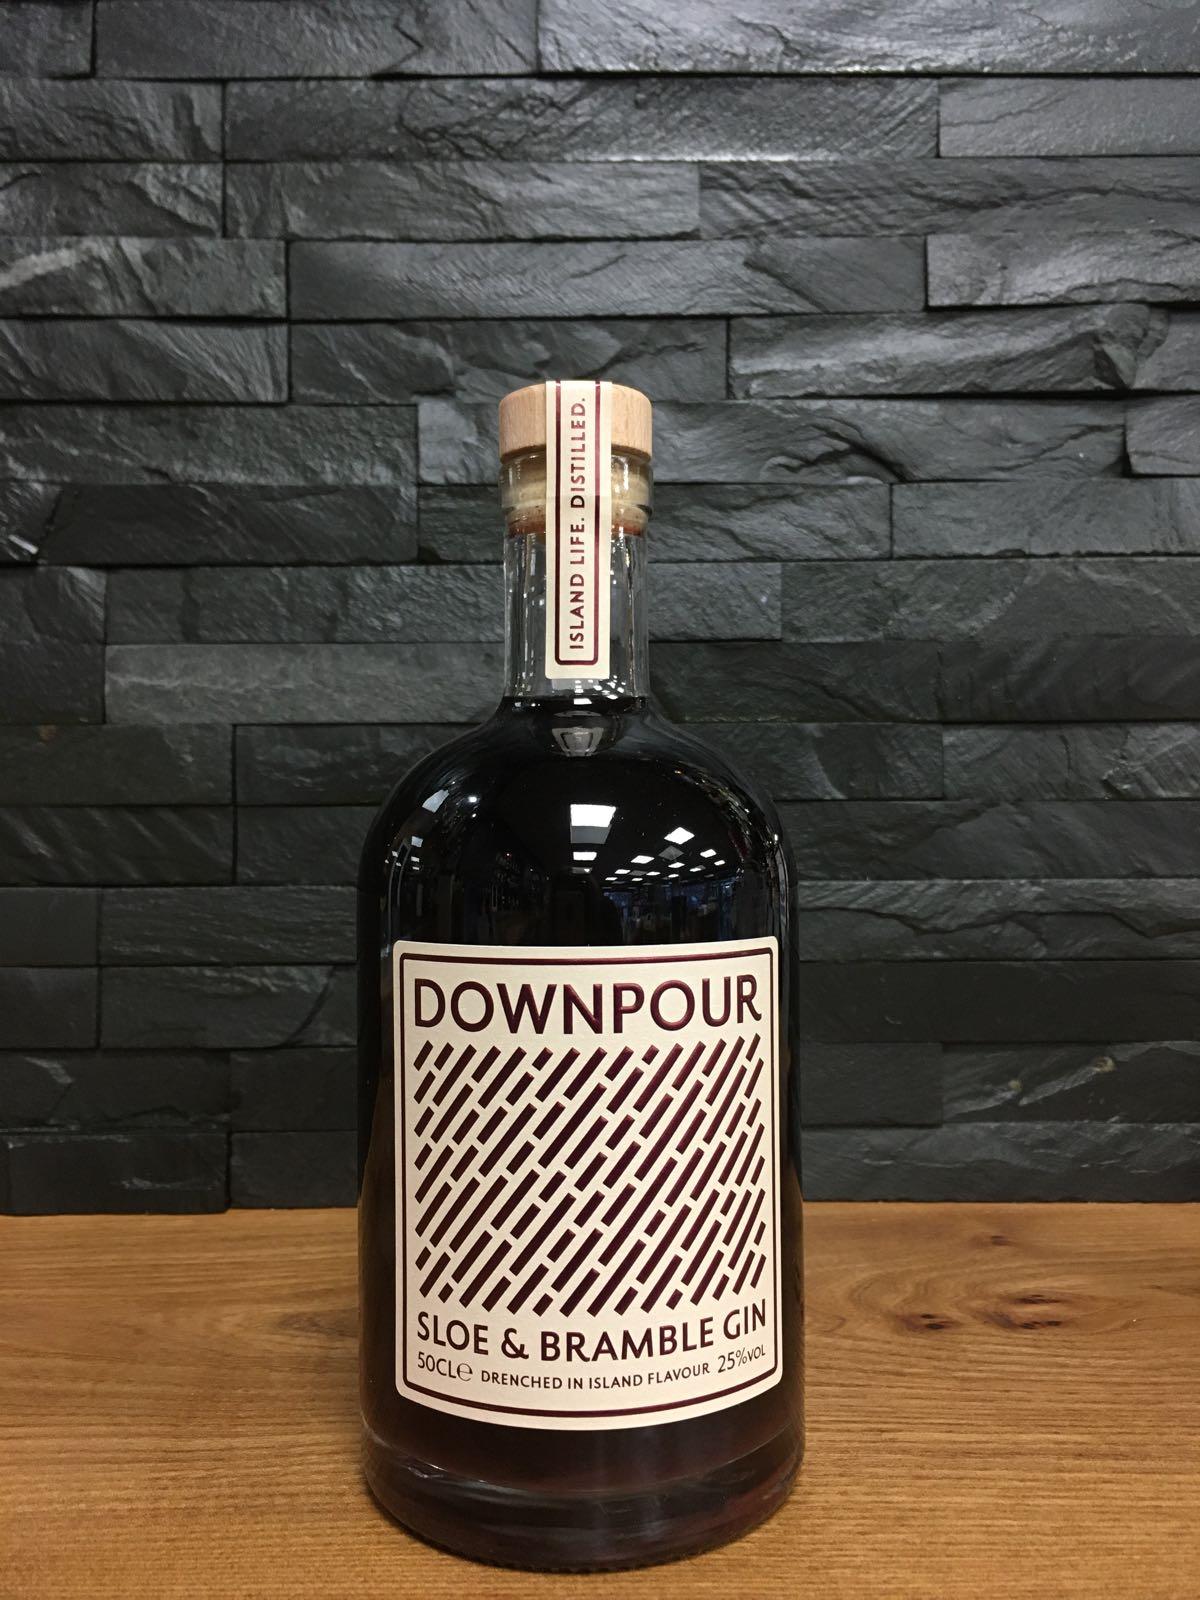 Downpour Sloe & Bramble Gin 50cl